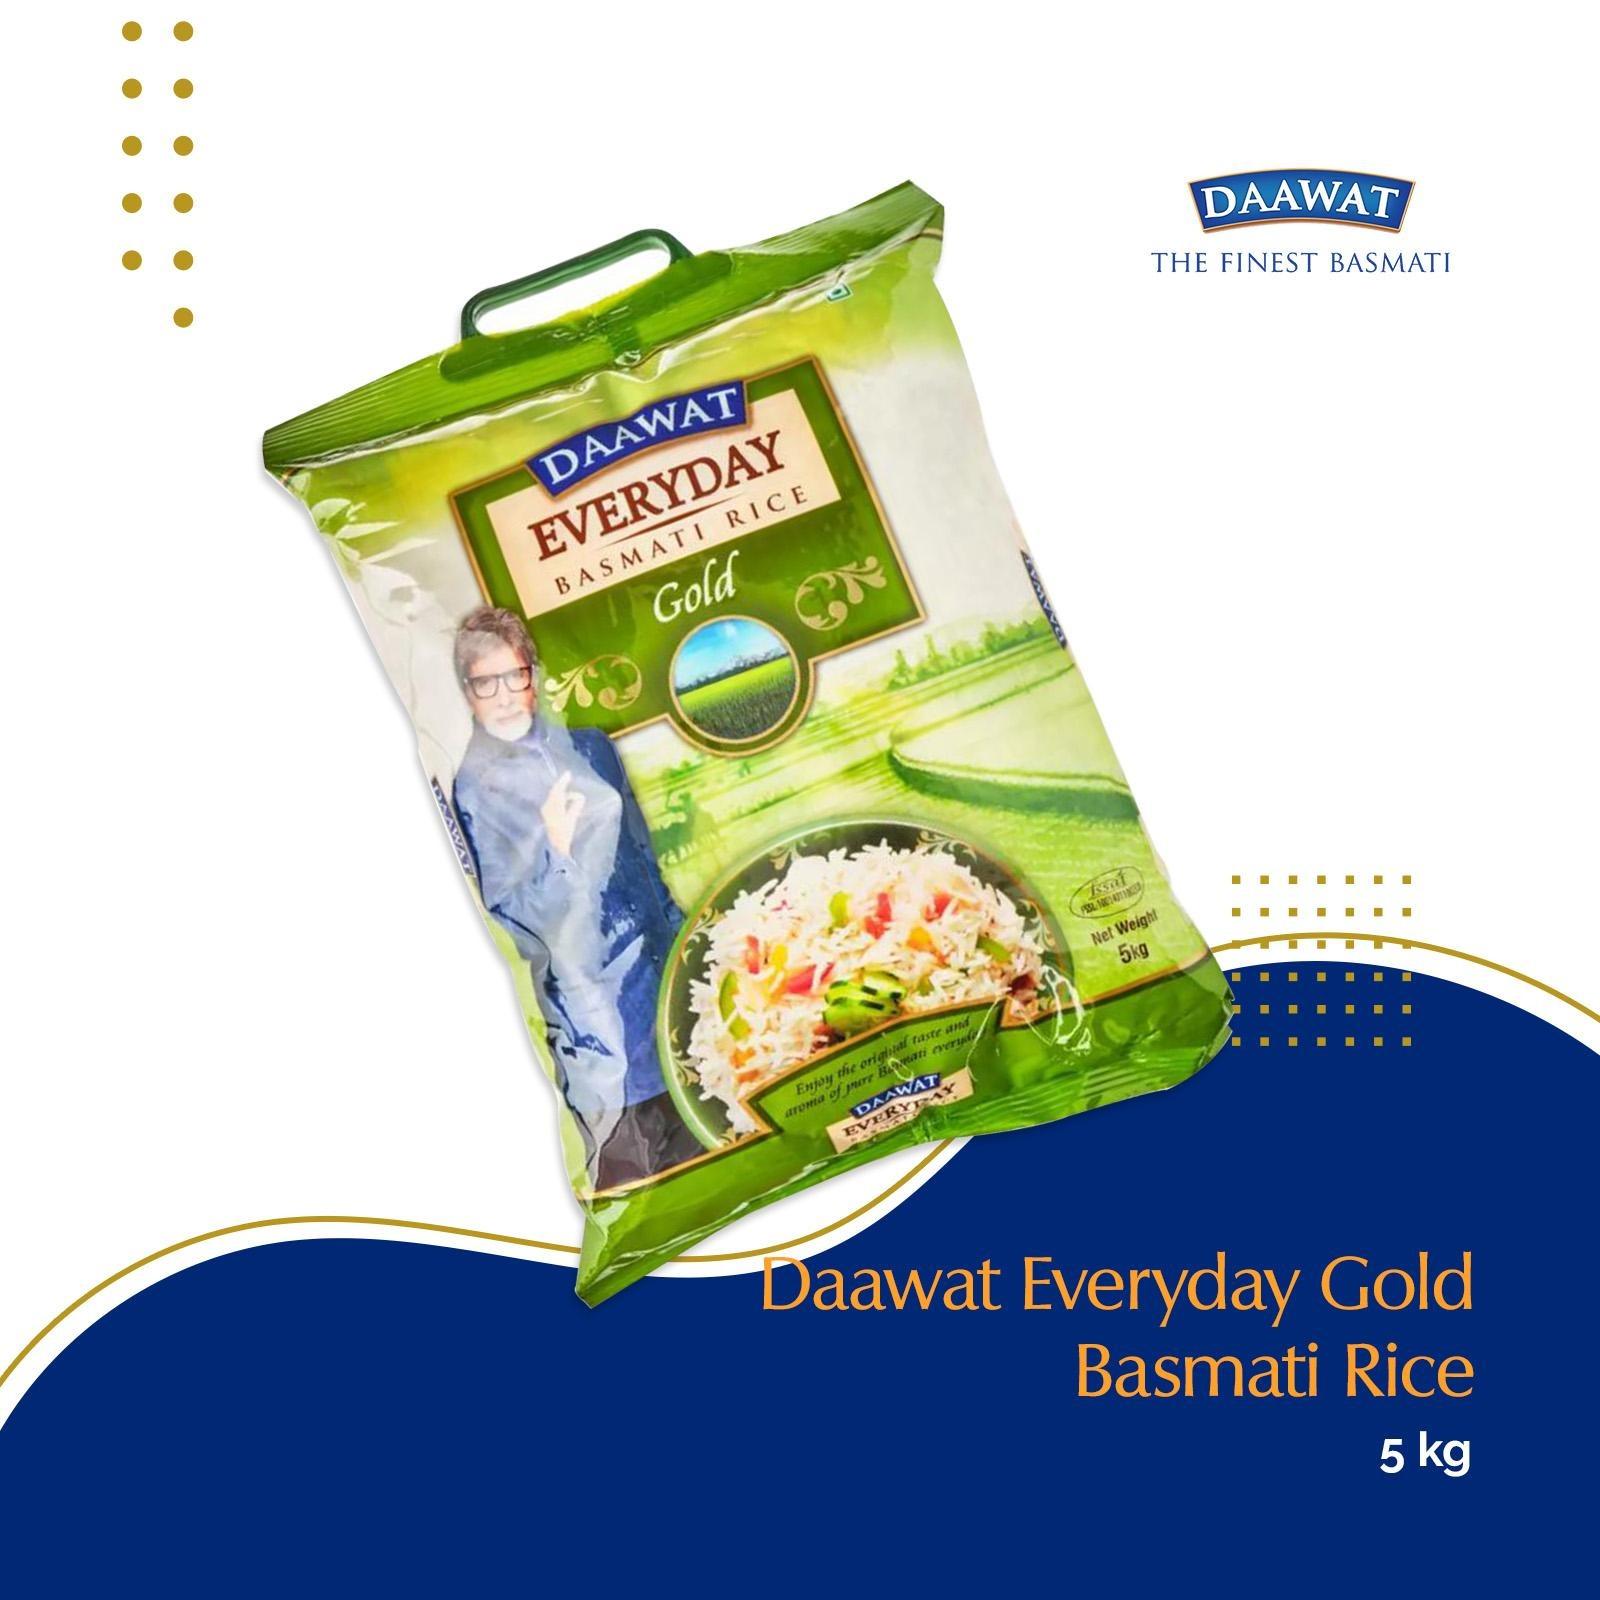 Daawat Everyday Gold Basmati Rice